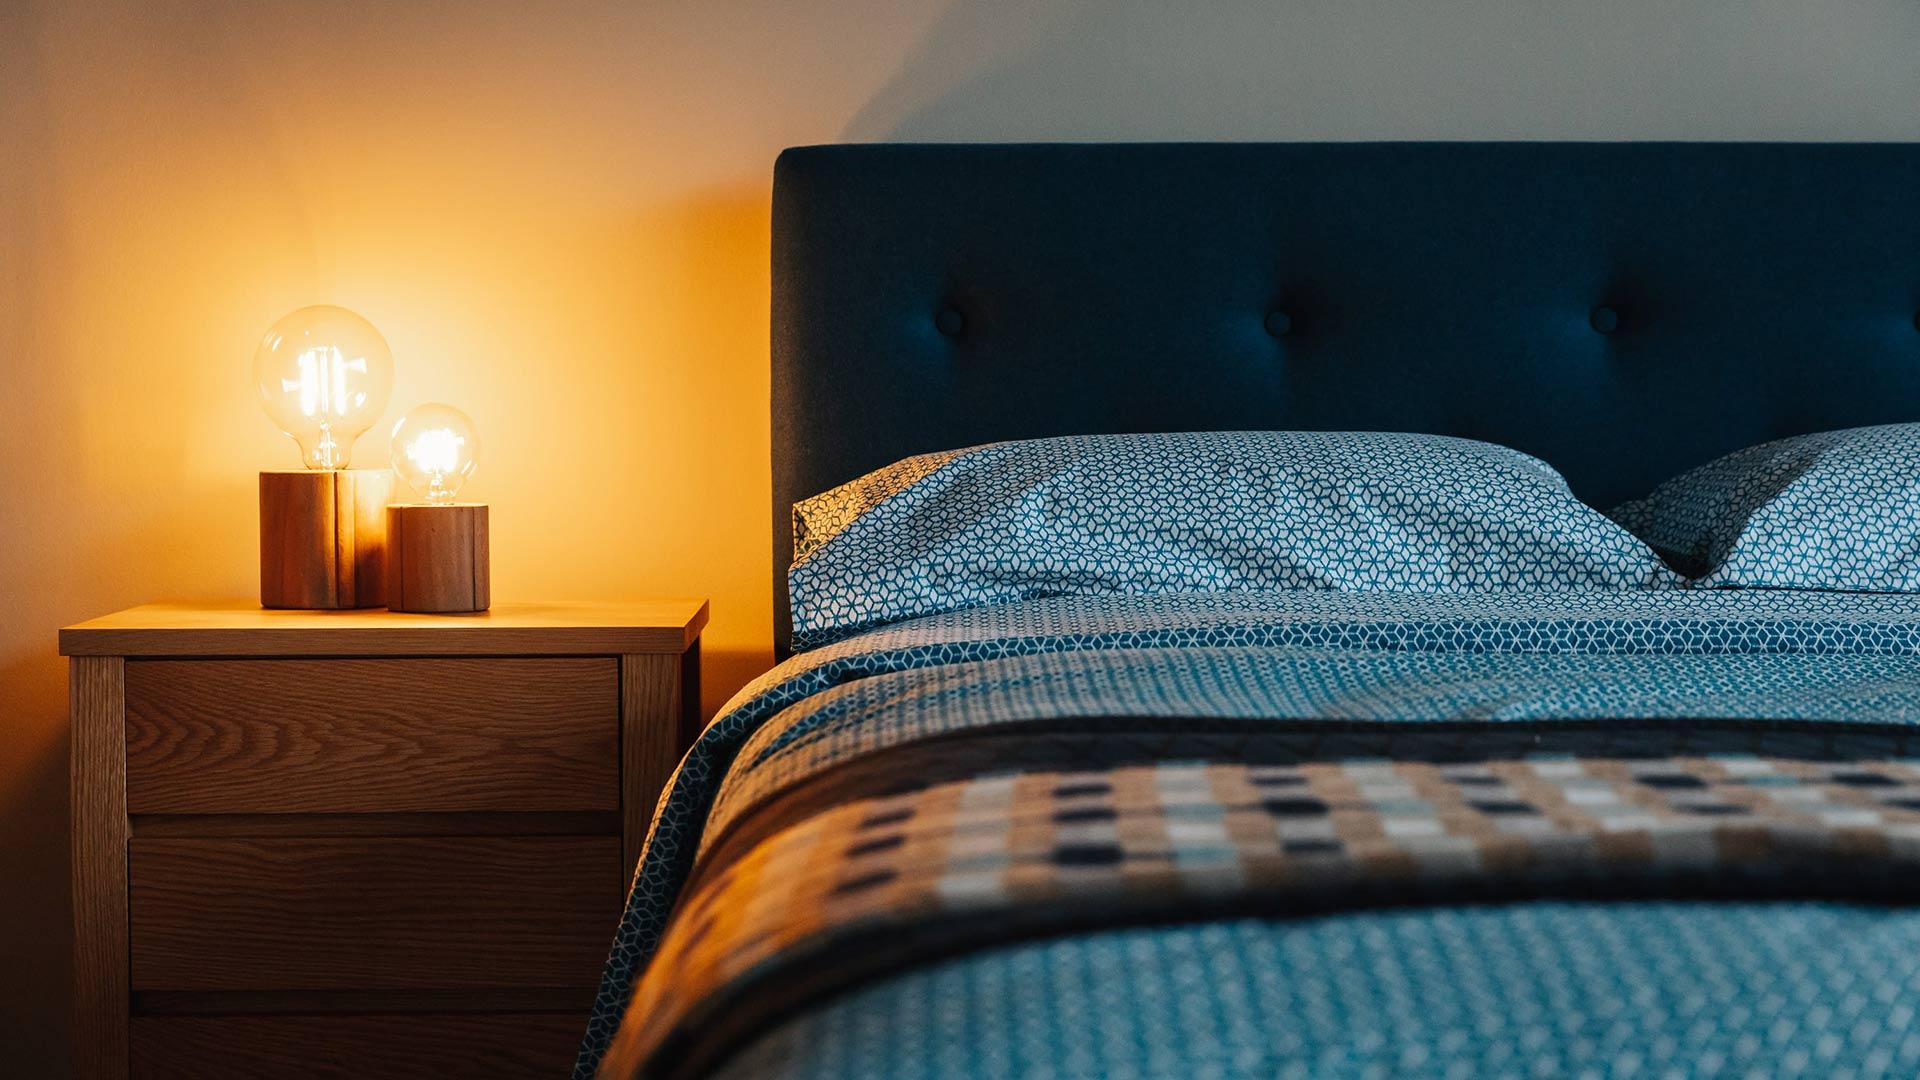 Wooden Bedside Lamp Holders Lighting Natural Bed Company